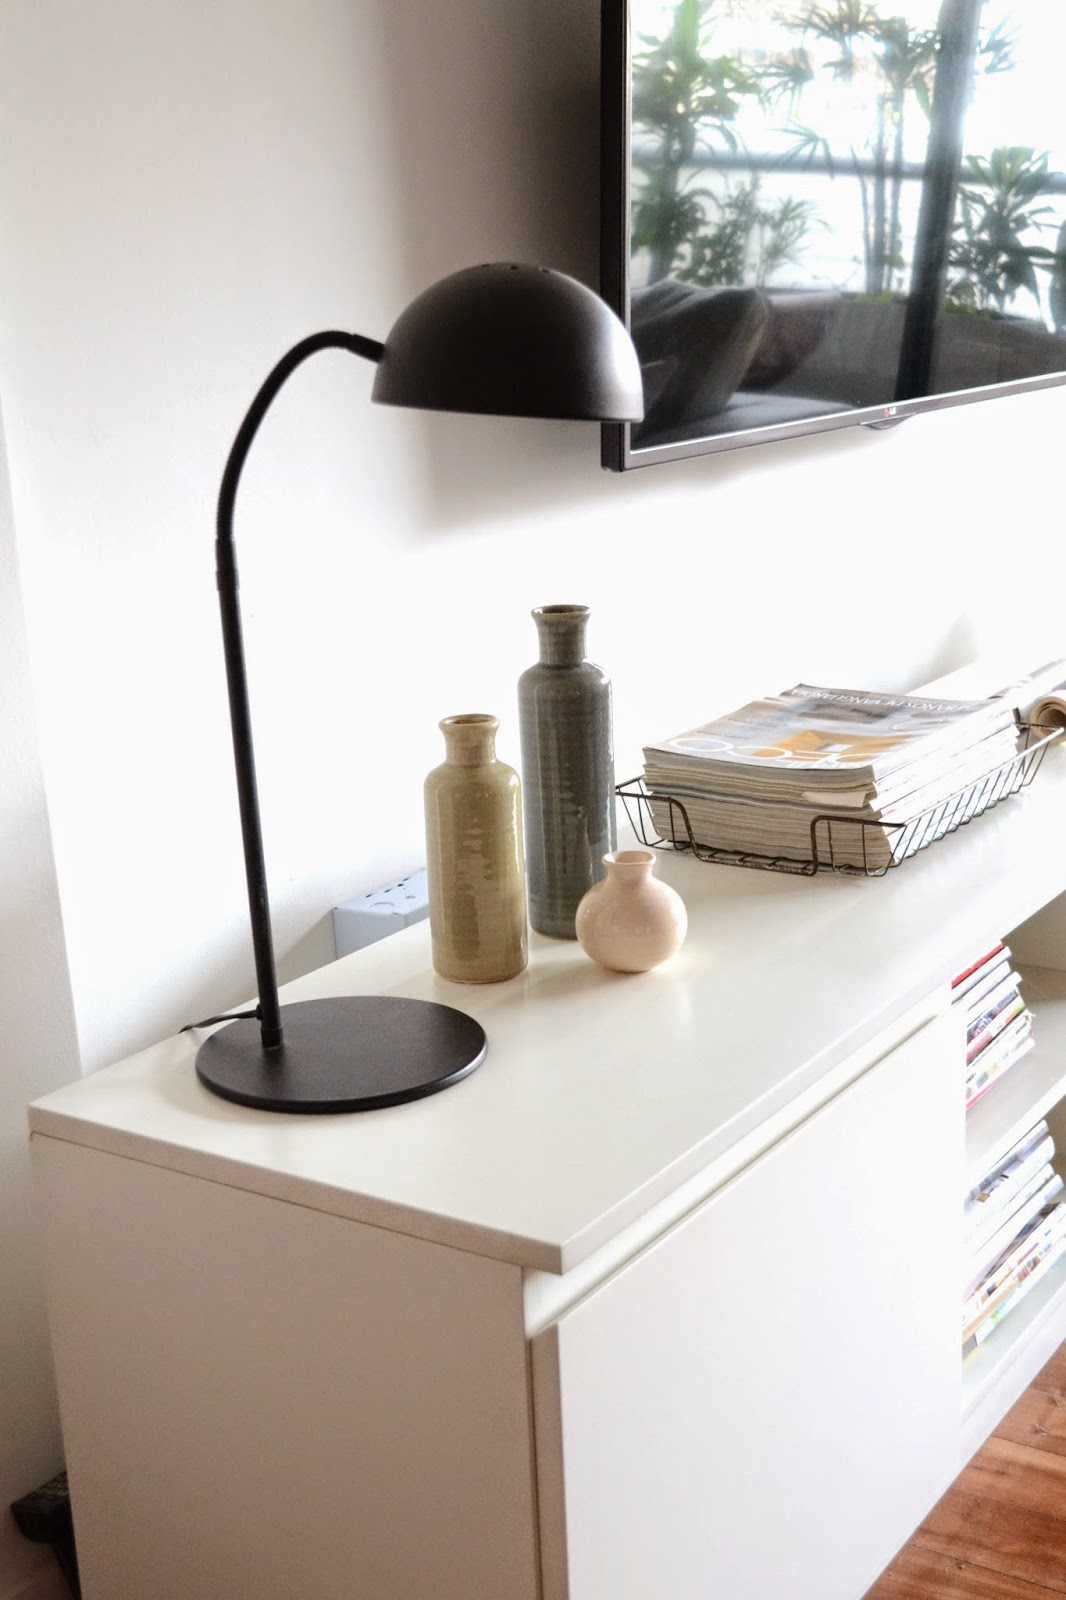 alma deco buenos aires proyecto roque perez. Black Bedroom Furniture Sets. Home Design Ideas